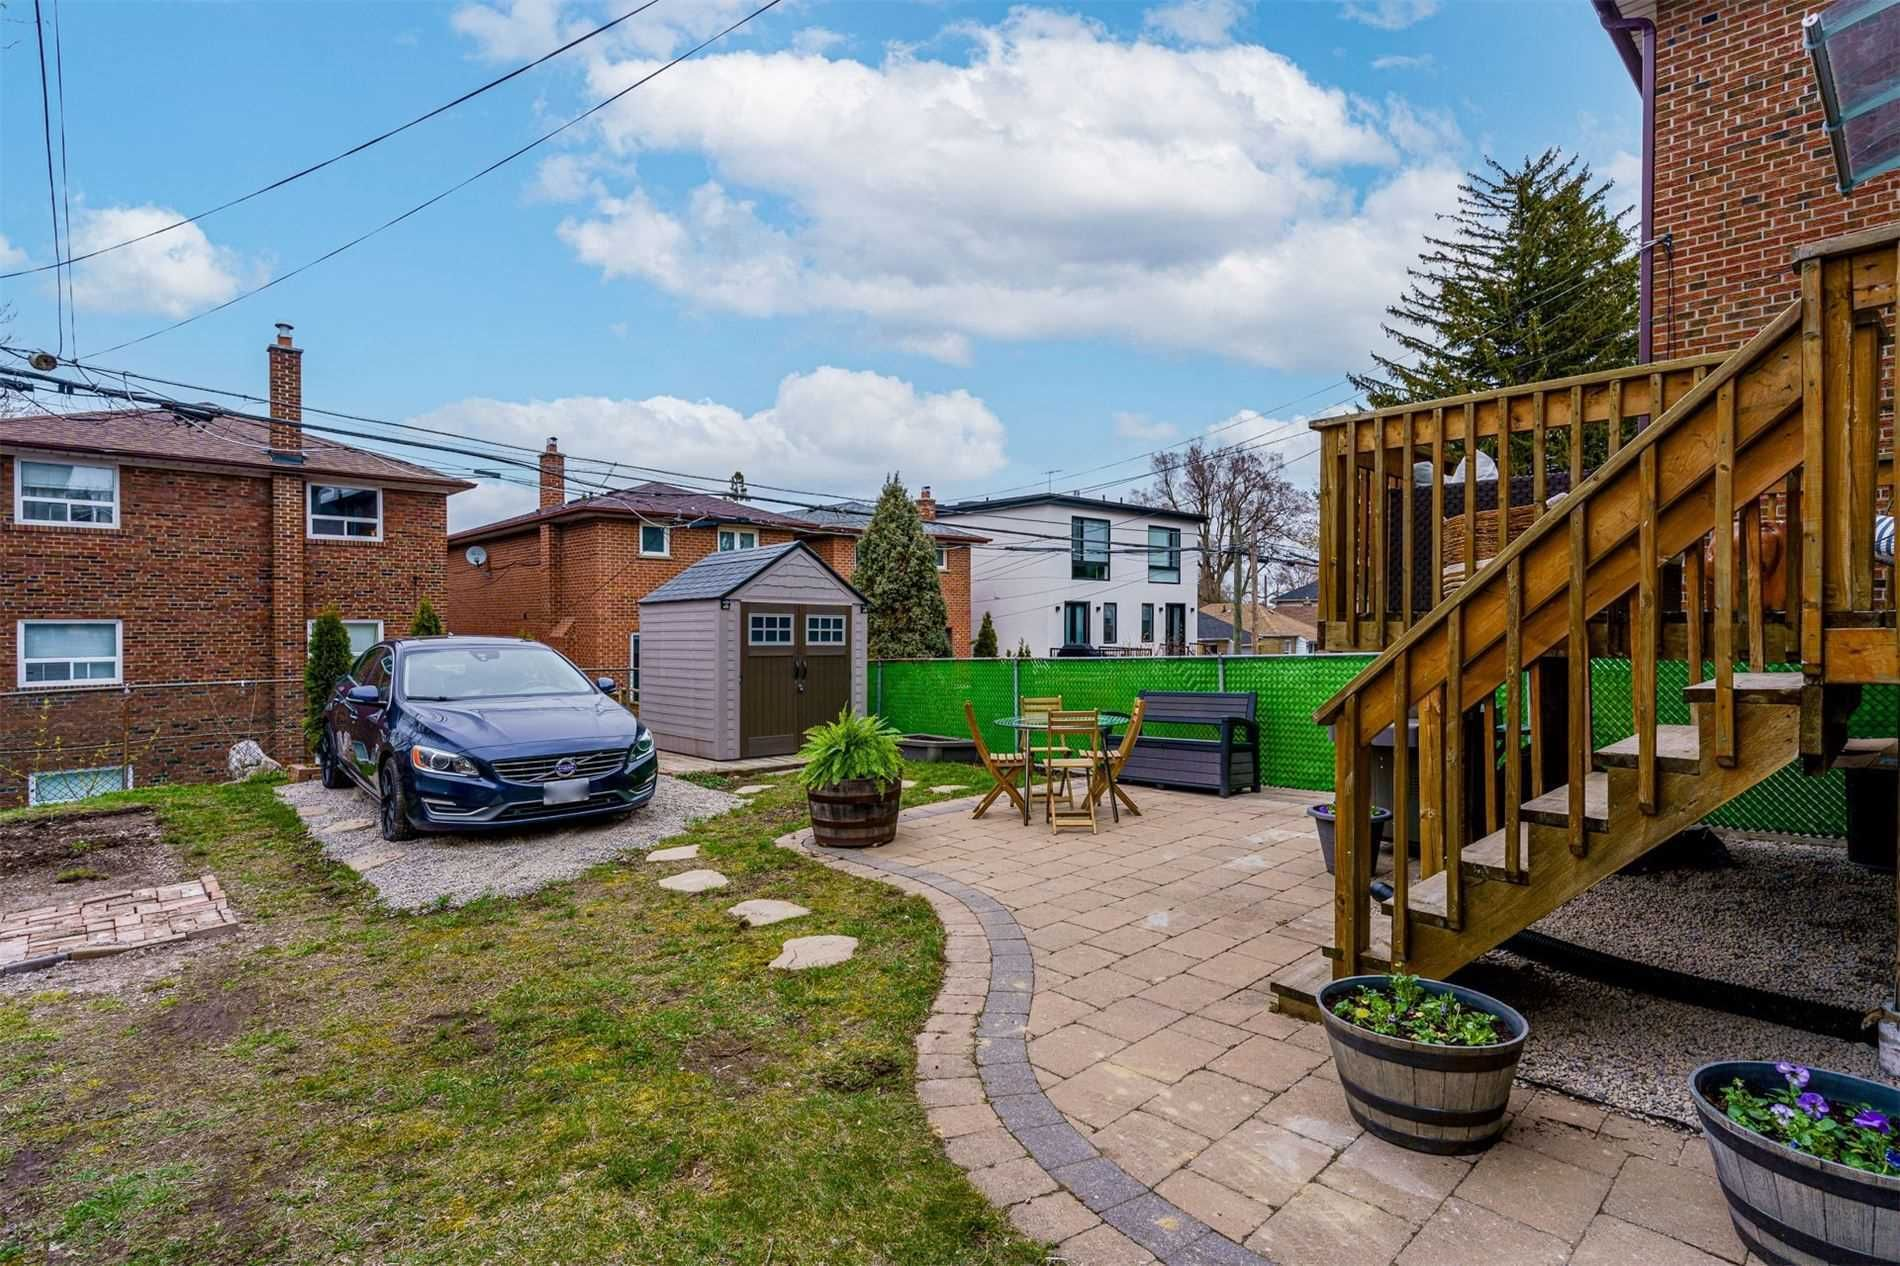 Photo 33: Photos: 92 Holborne Avenue in Toronto: Danforth Village-East York House (2-Storey) for sale (Toronto E03)  : MLS®# E5204452